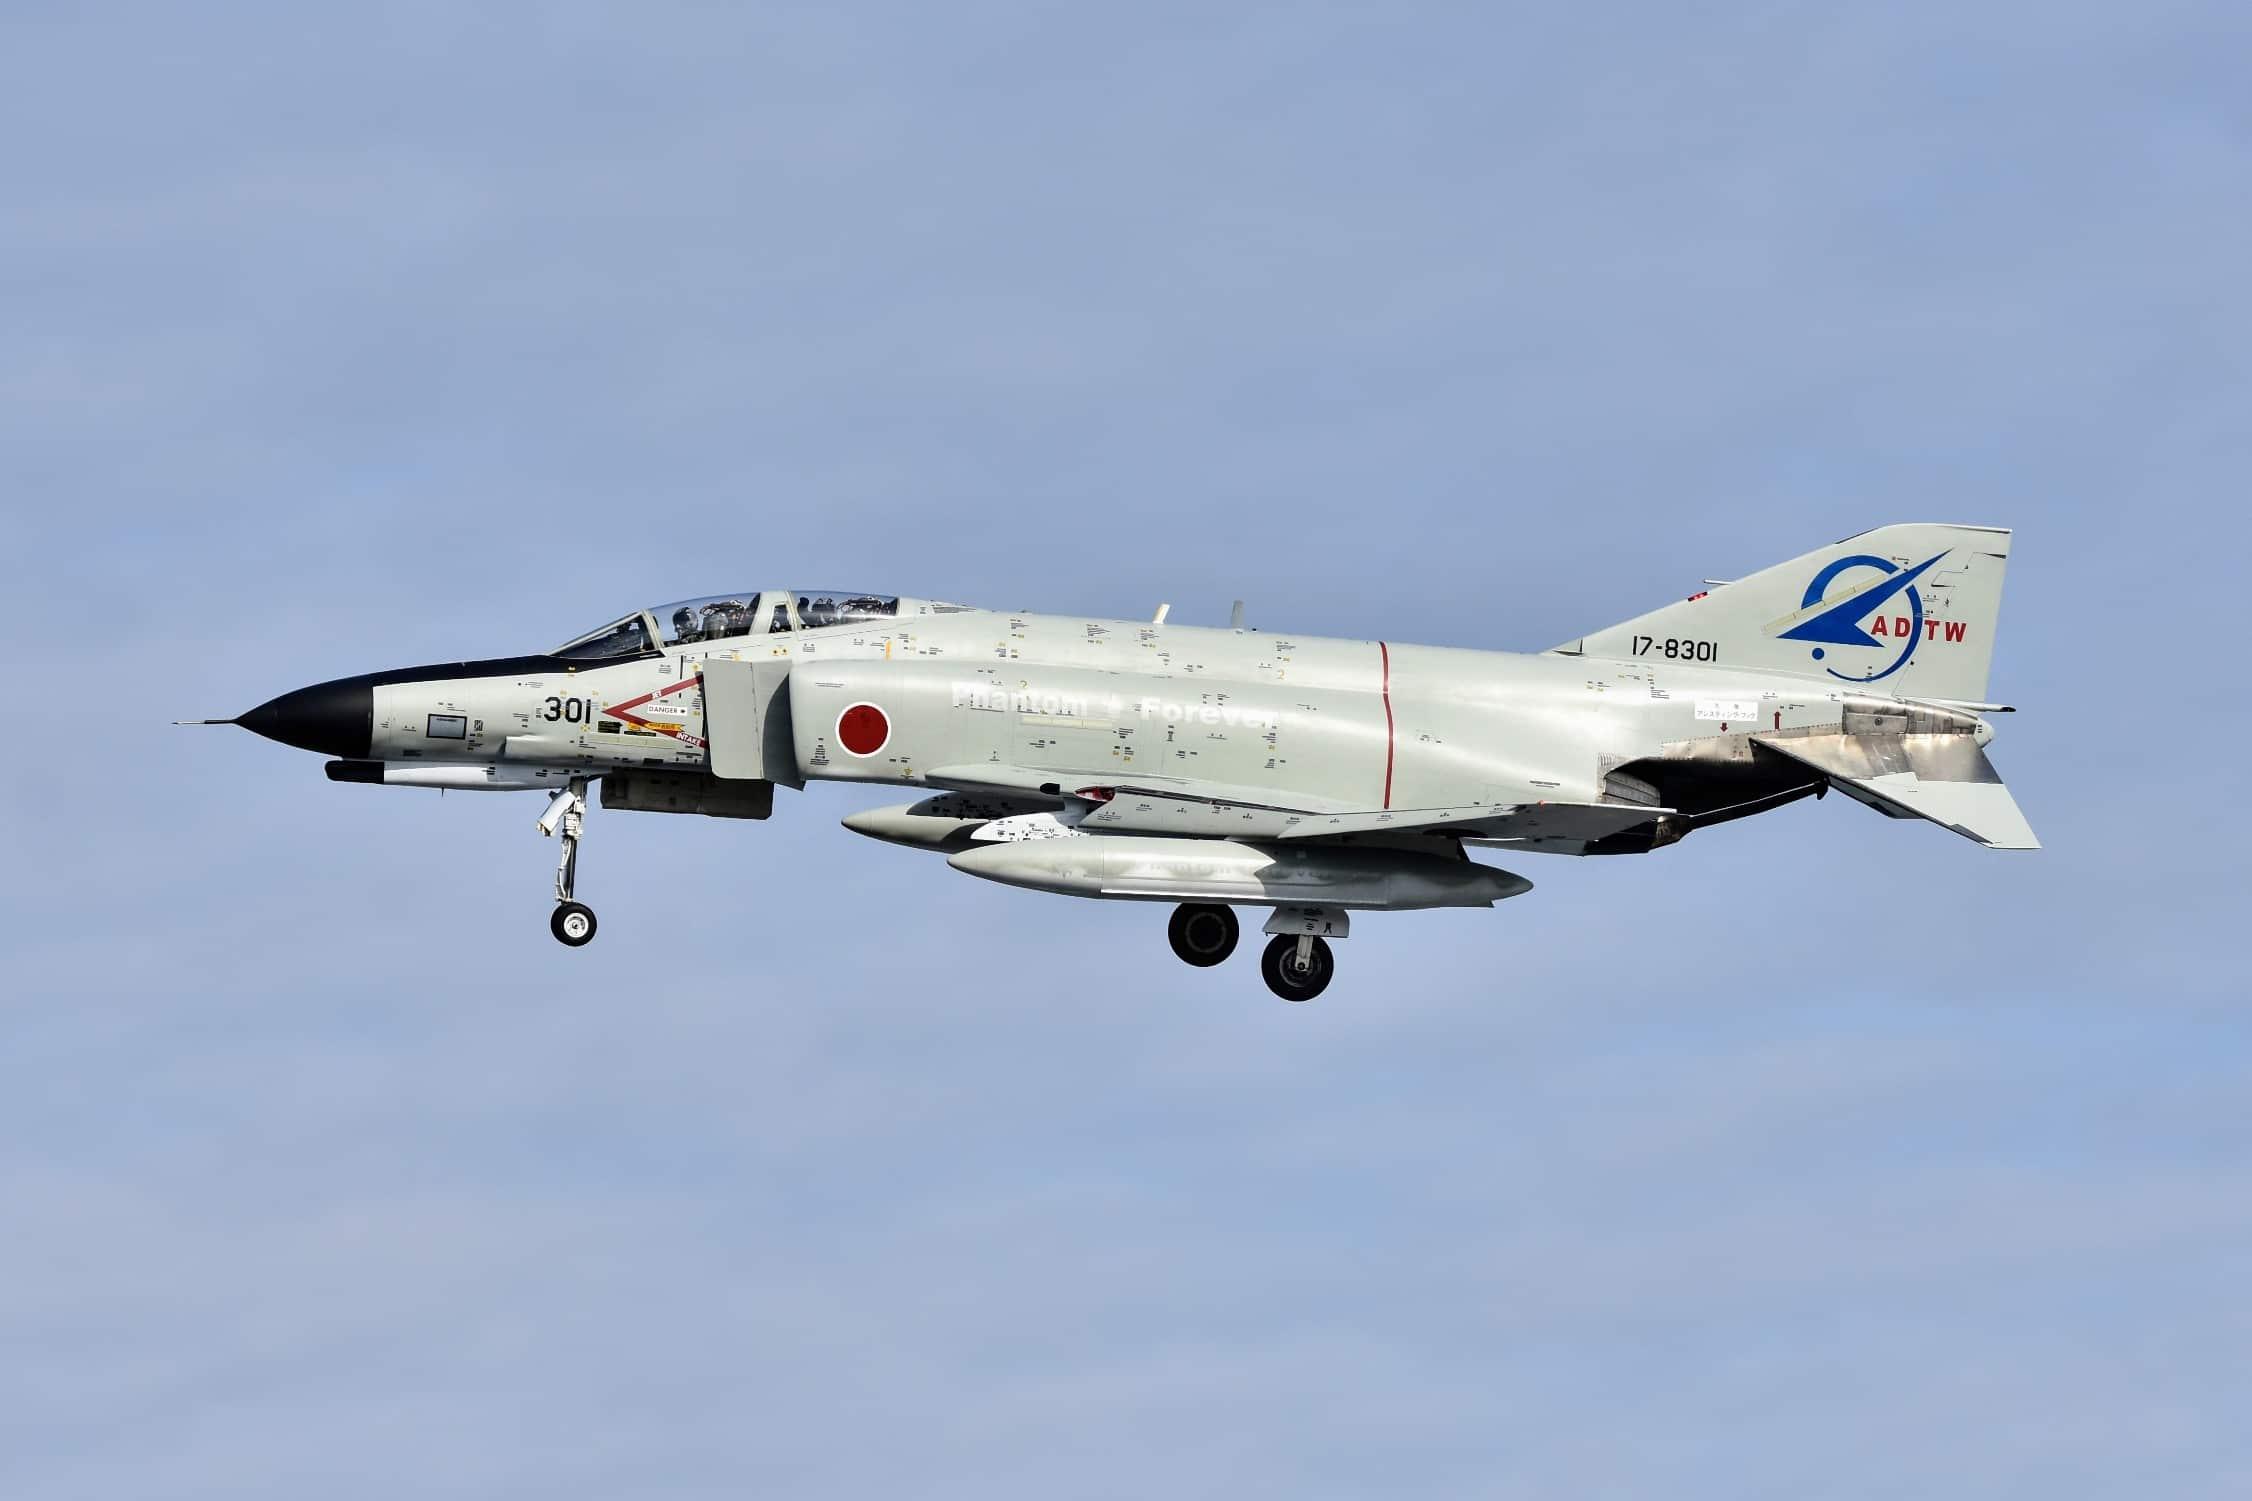 © Masanori Hirose - F-4EJ Phantom 17-8301